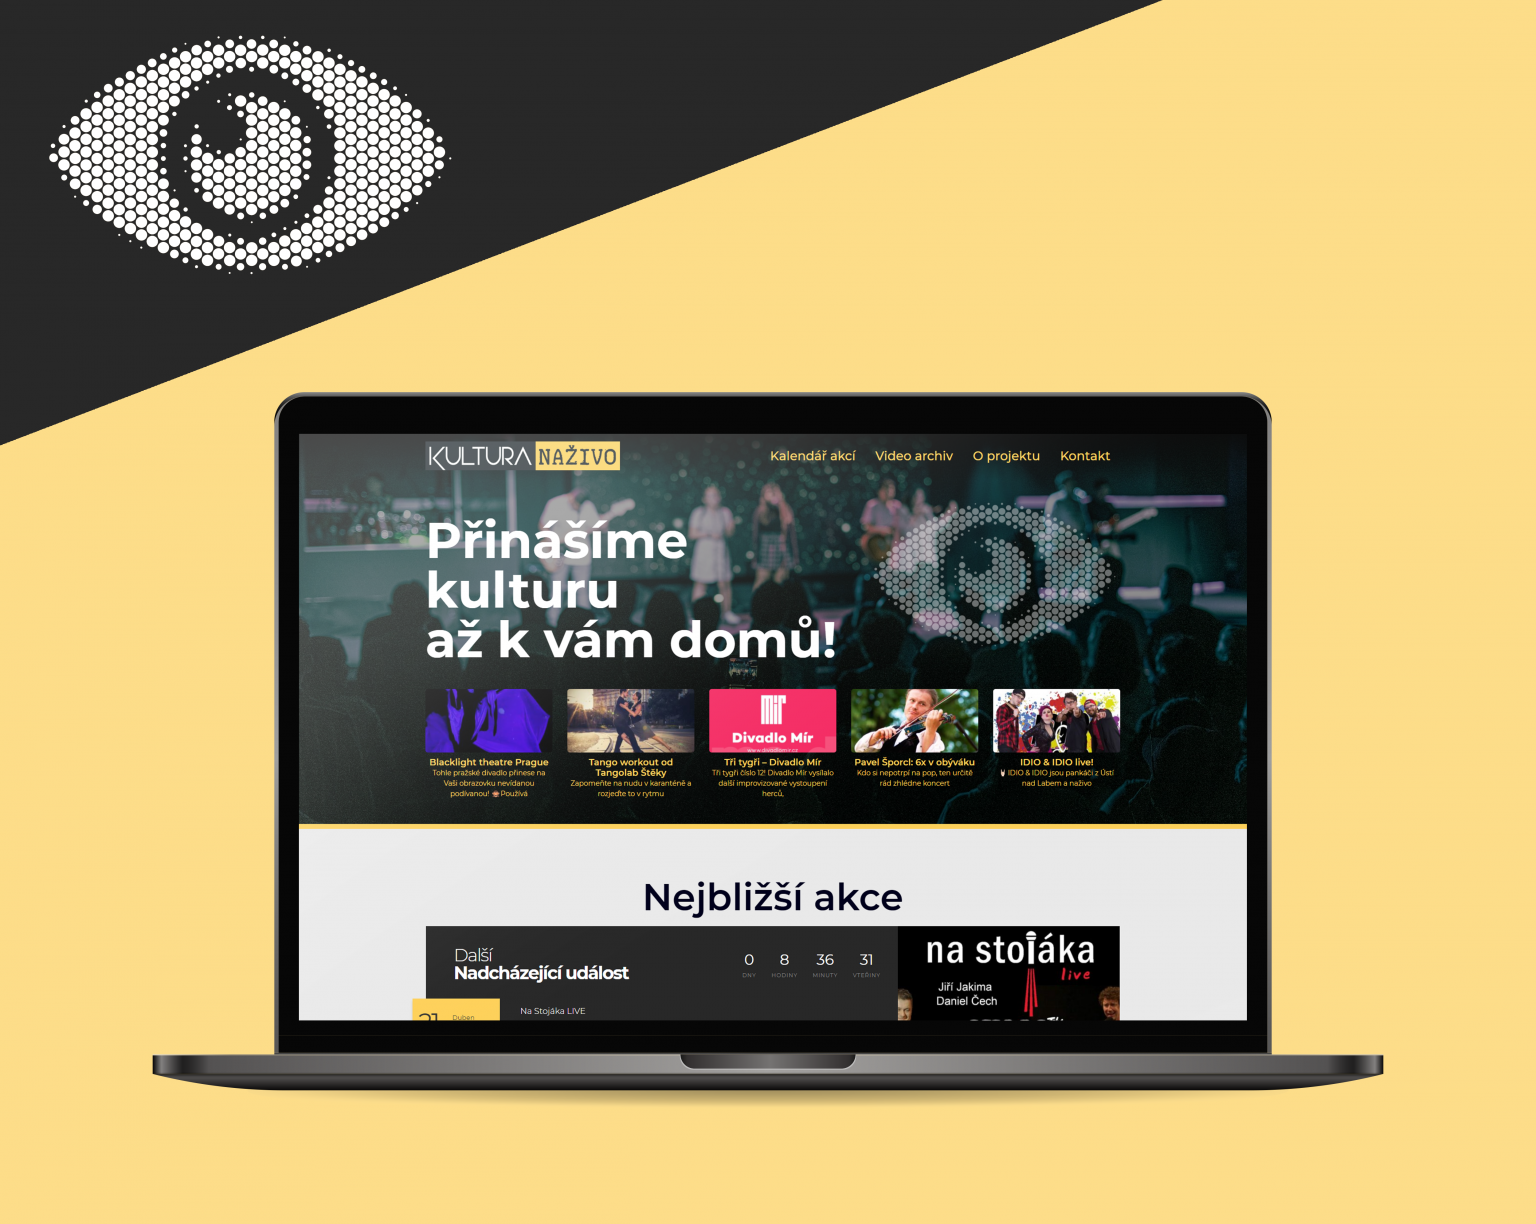 Webové stránky Kultura Naživo